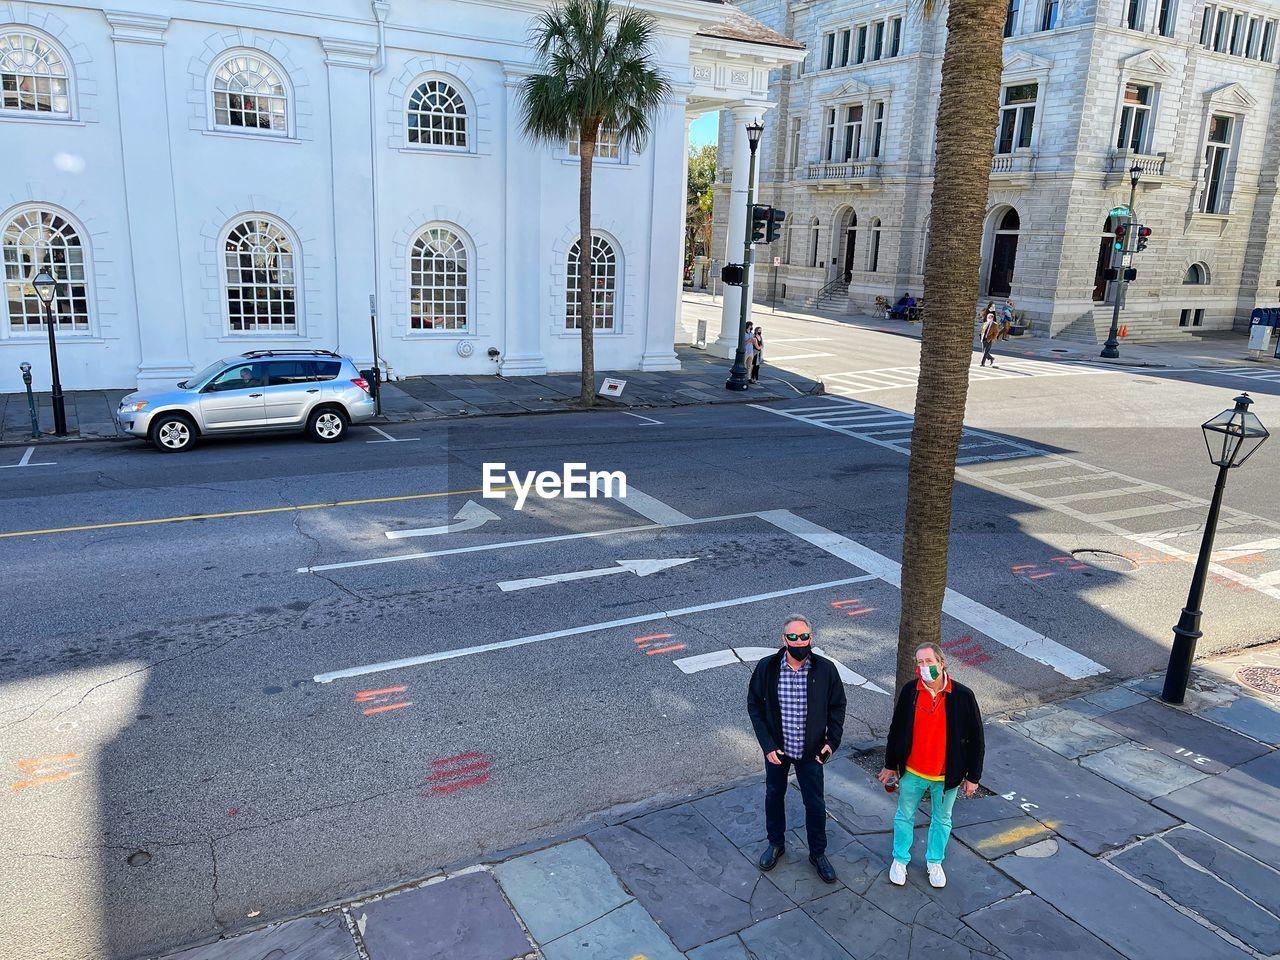 PEOPLE STANDING ON STREET